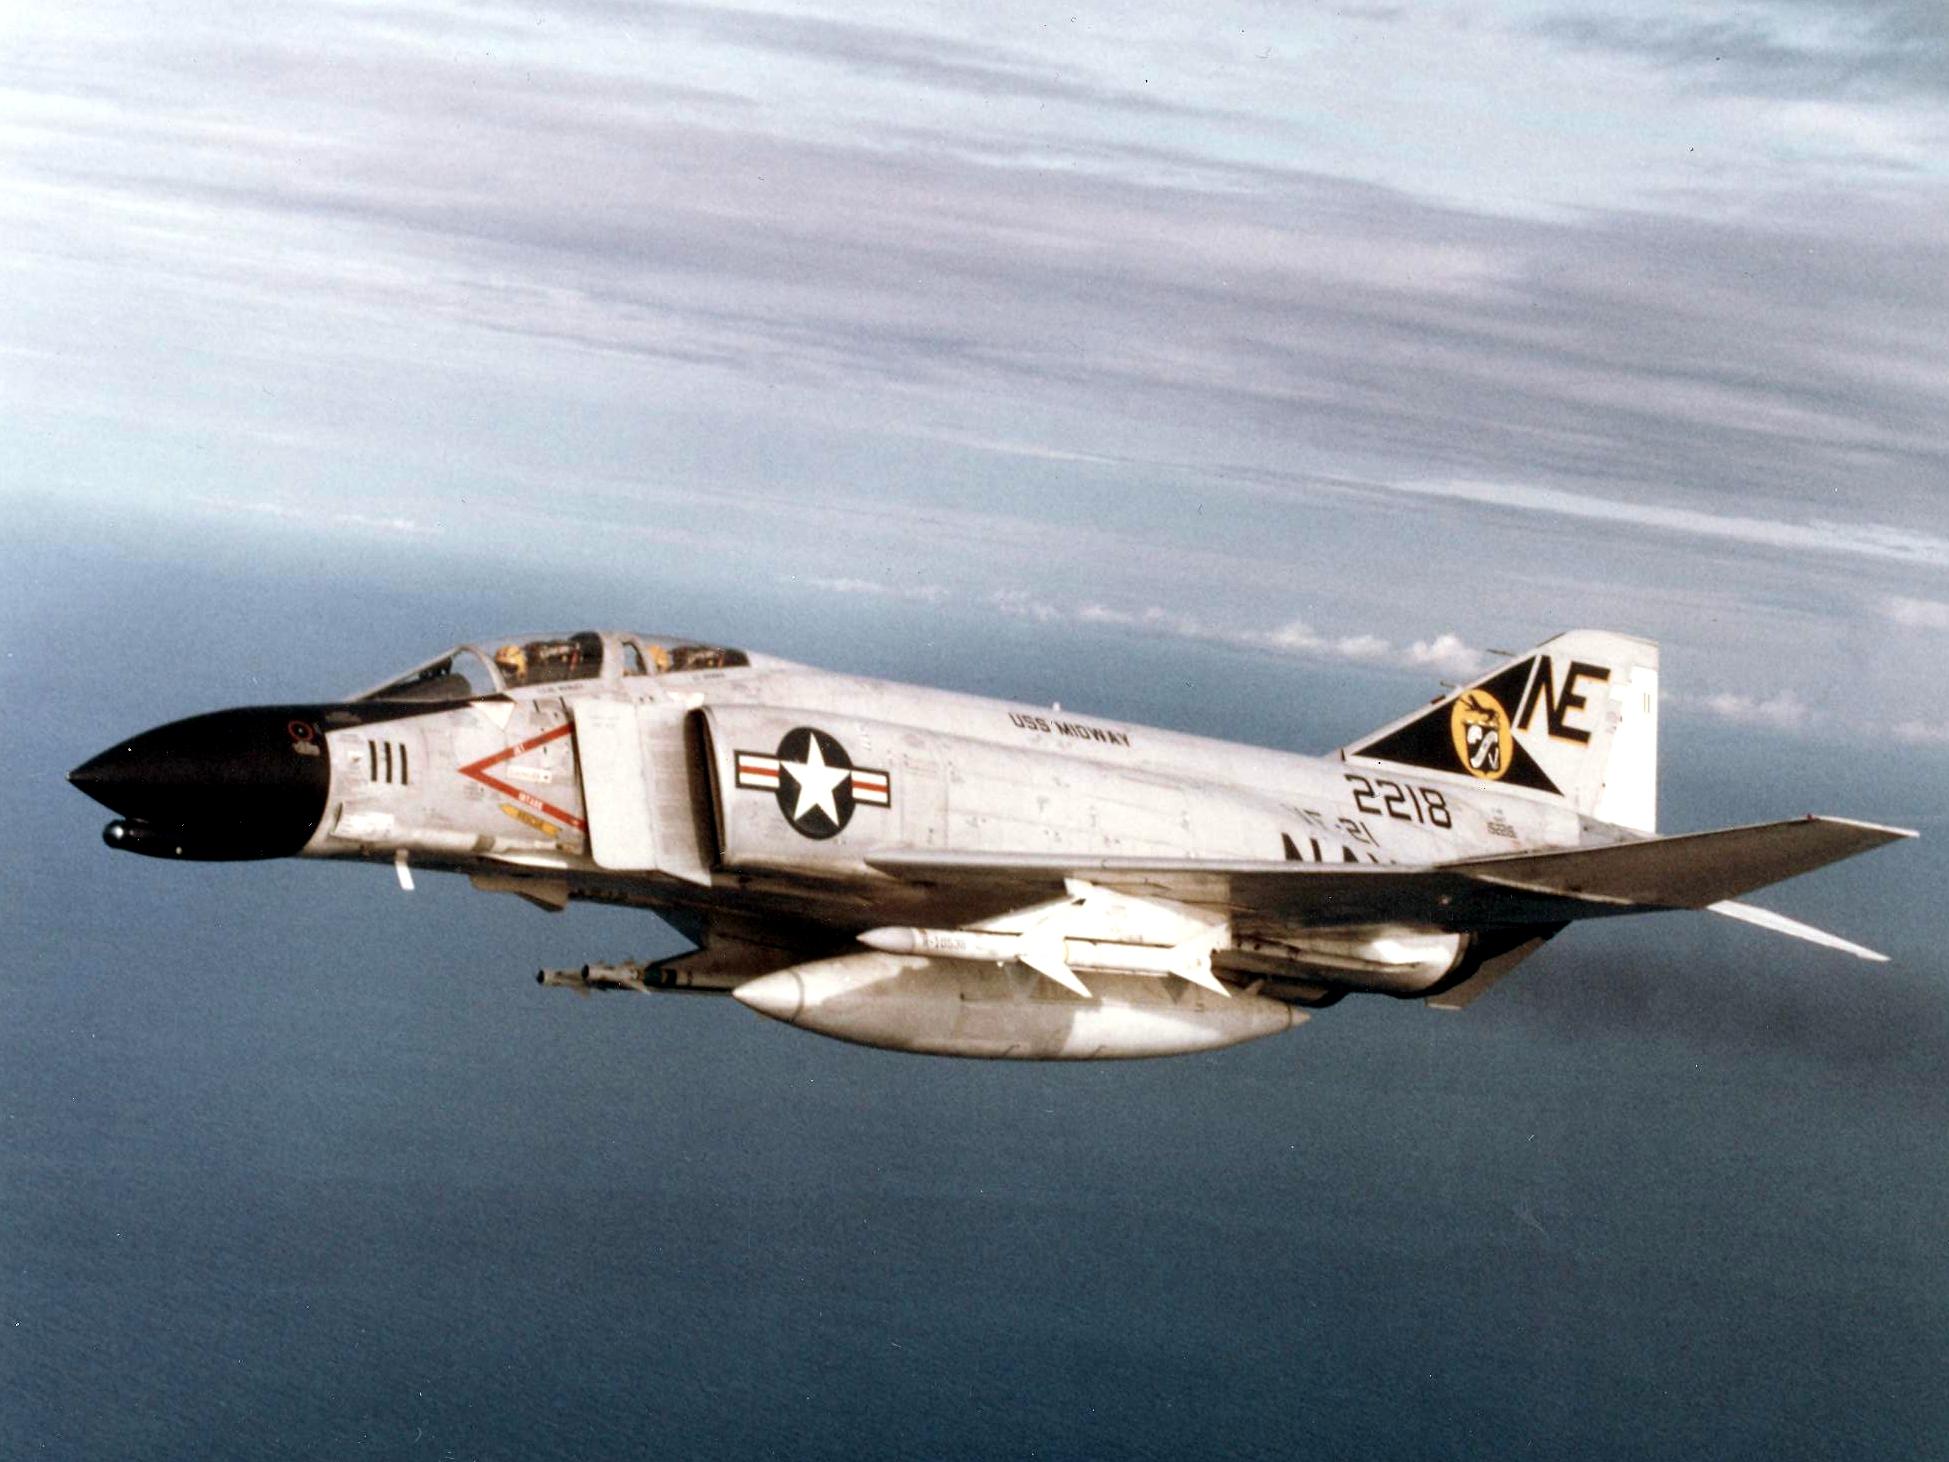 F-4B_Phantom_of_VF-21_over_Vietnam_1965.